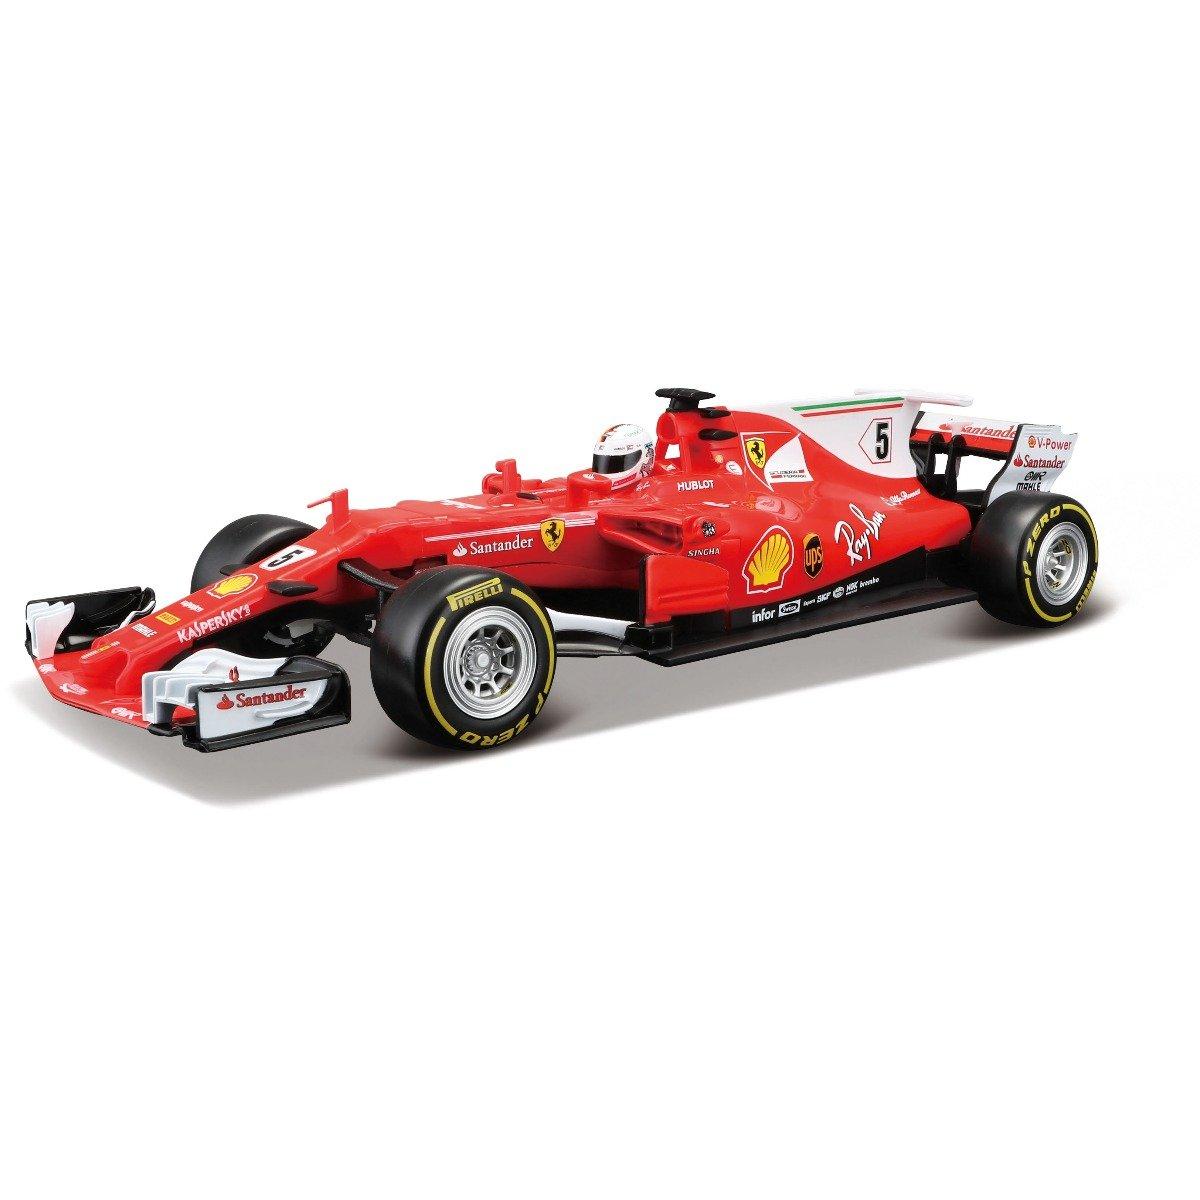 Masinuta cu telecomanda Maisto Ferrari SF70H, 1:24, 40 MHz